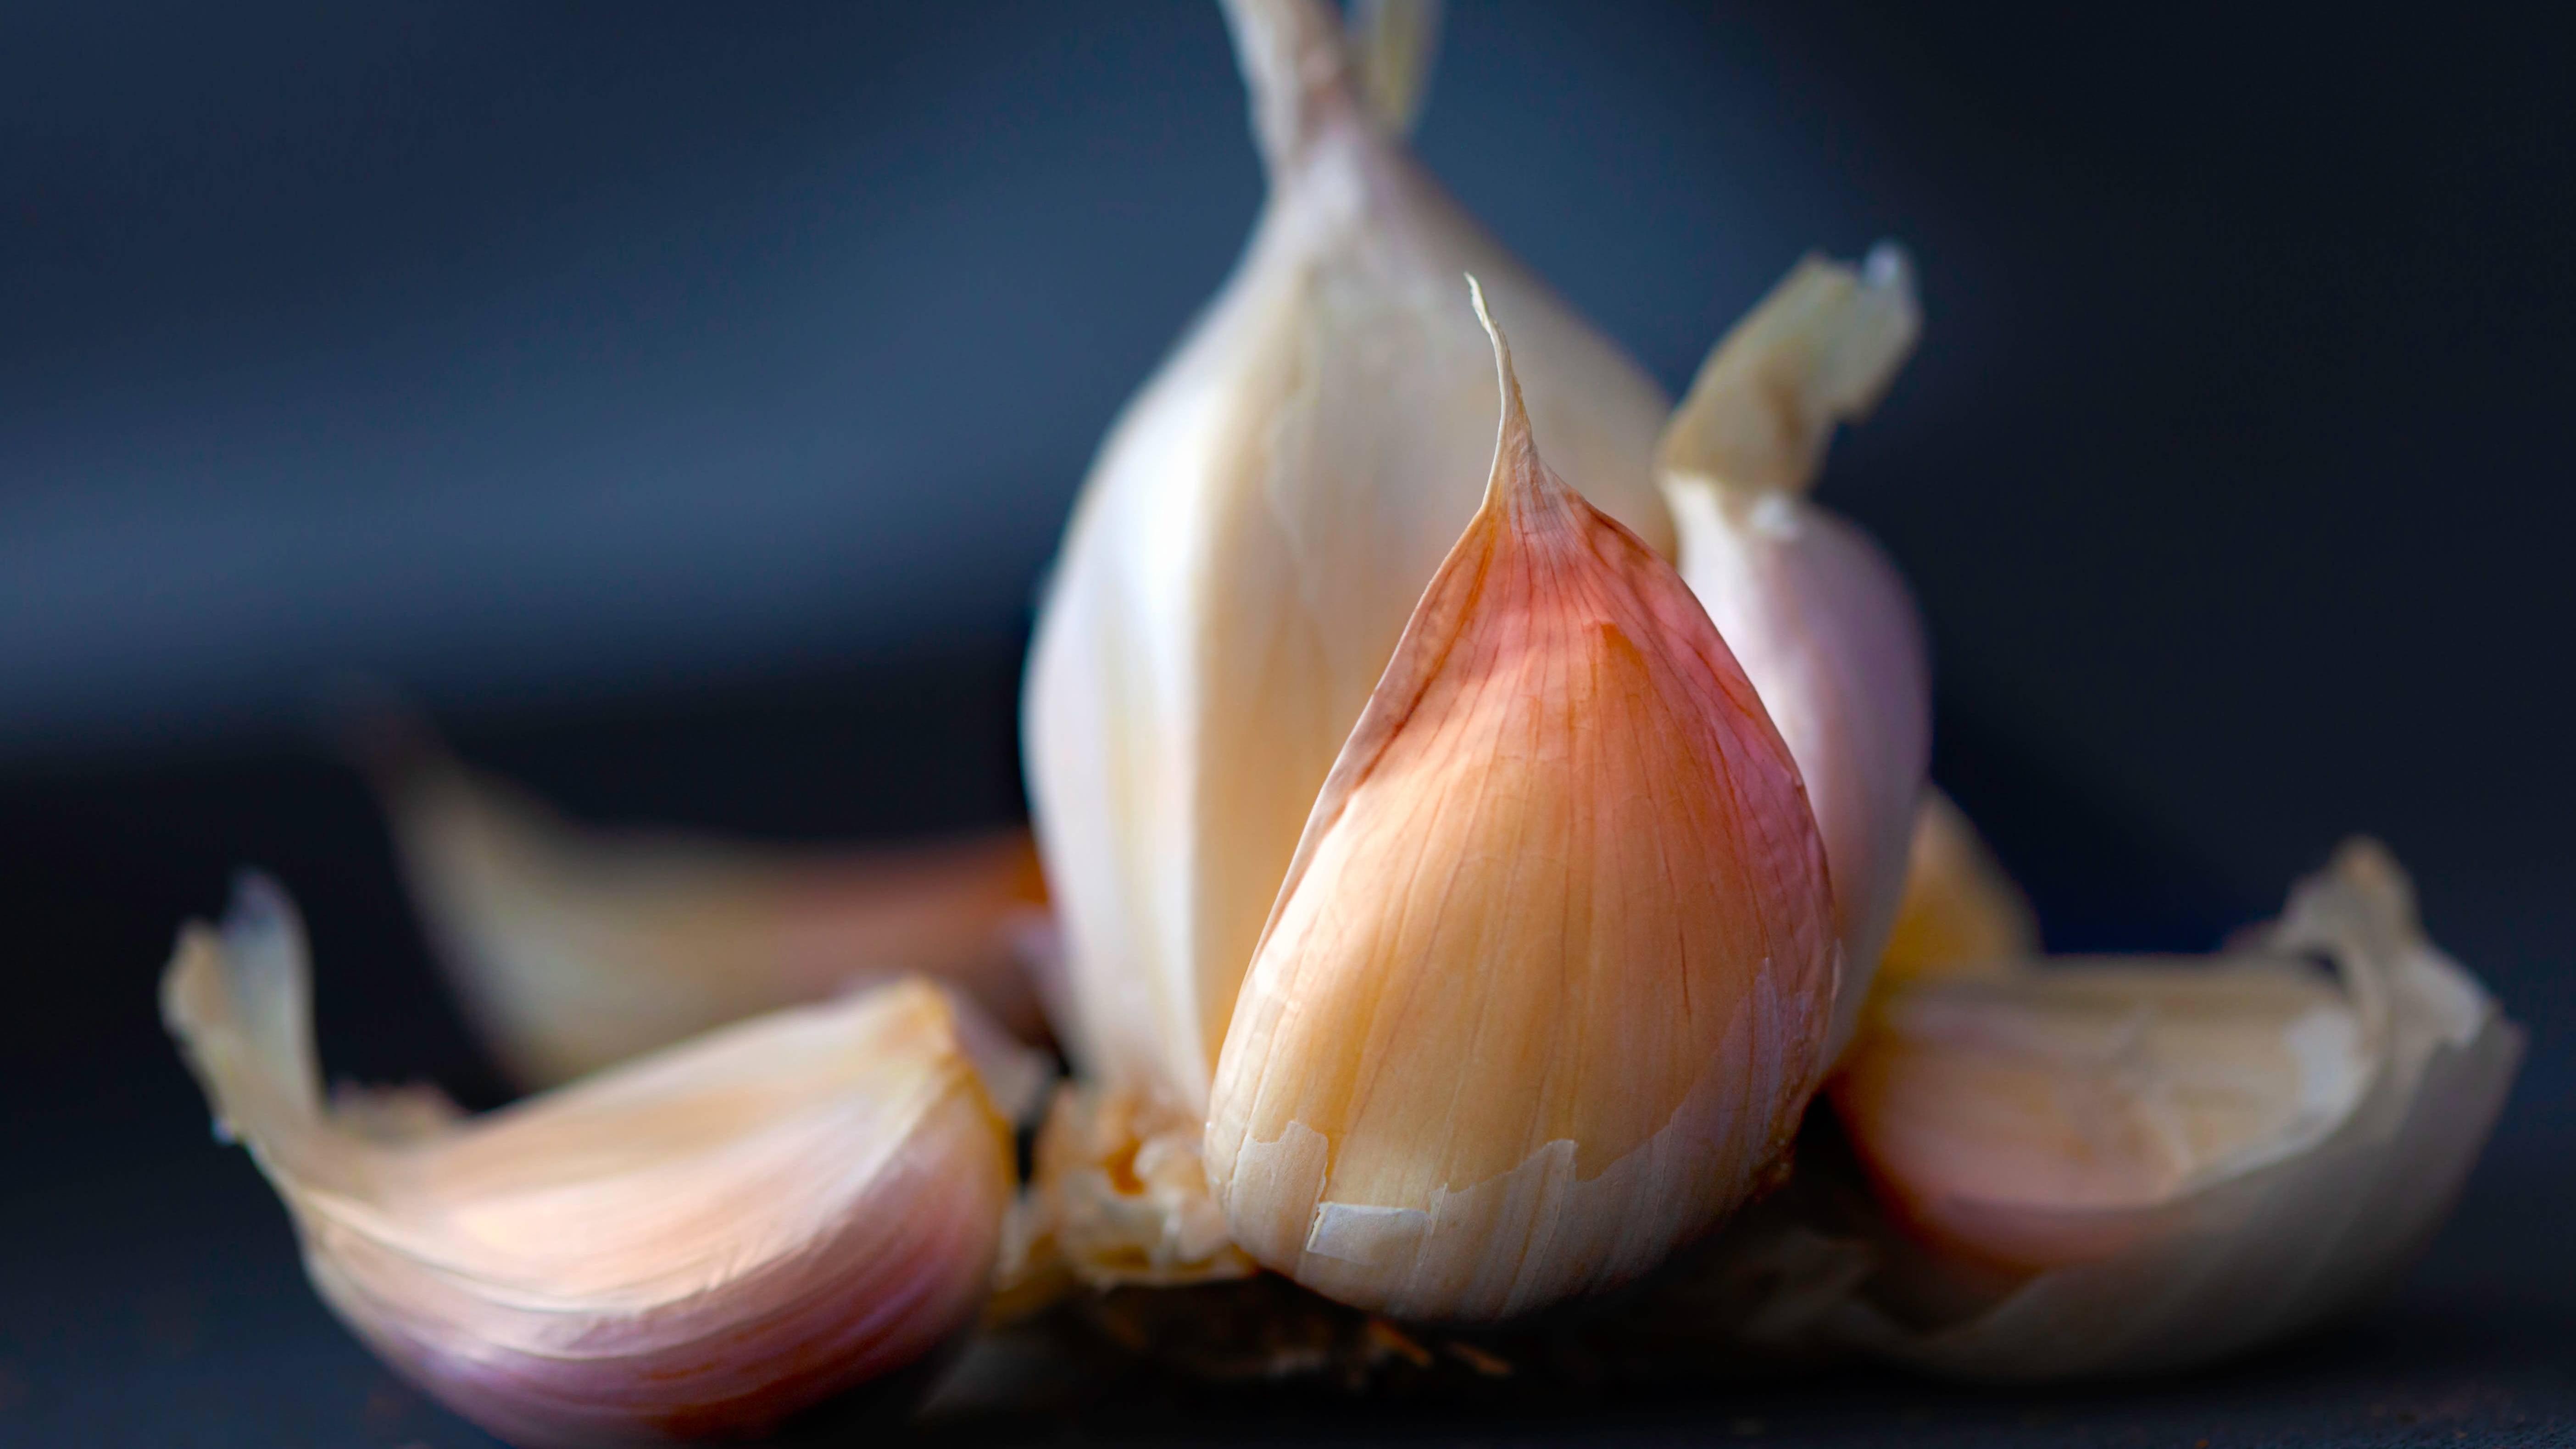 That Viral Garlic Hack Doesn't Work